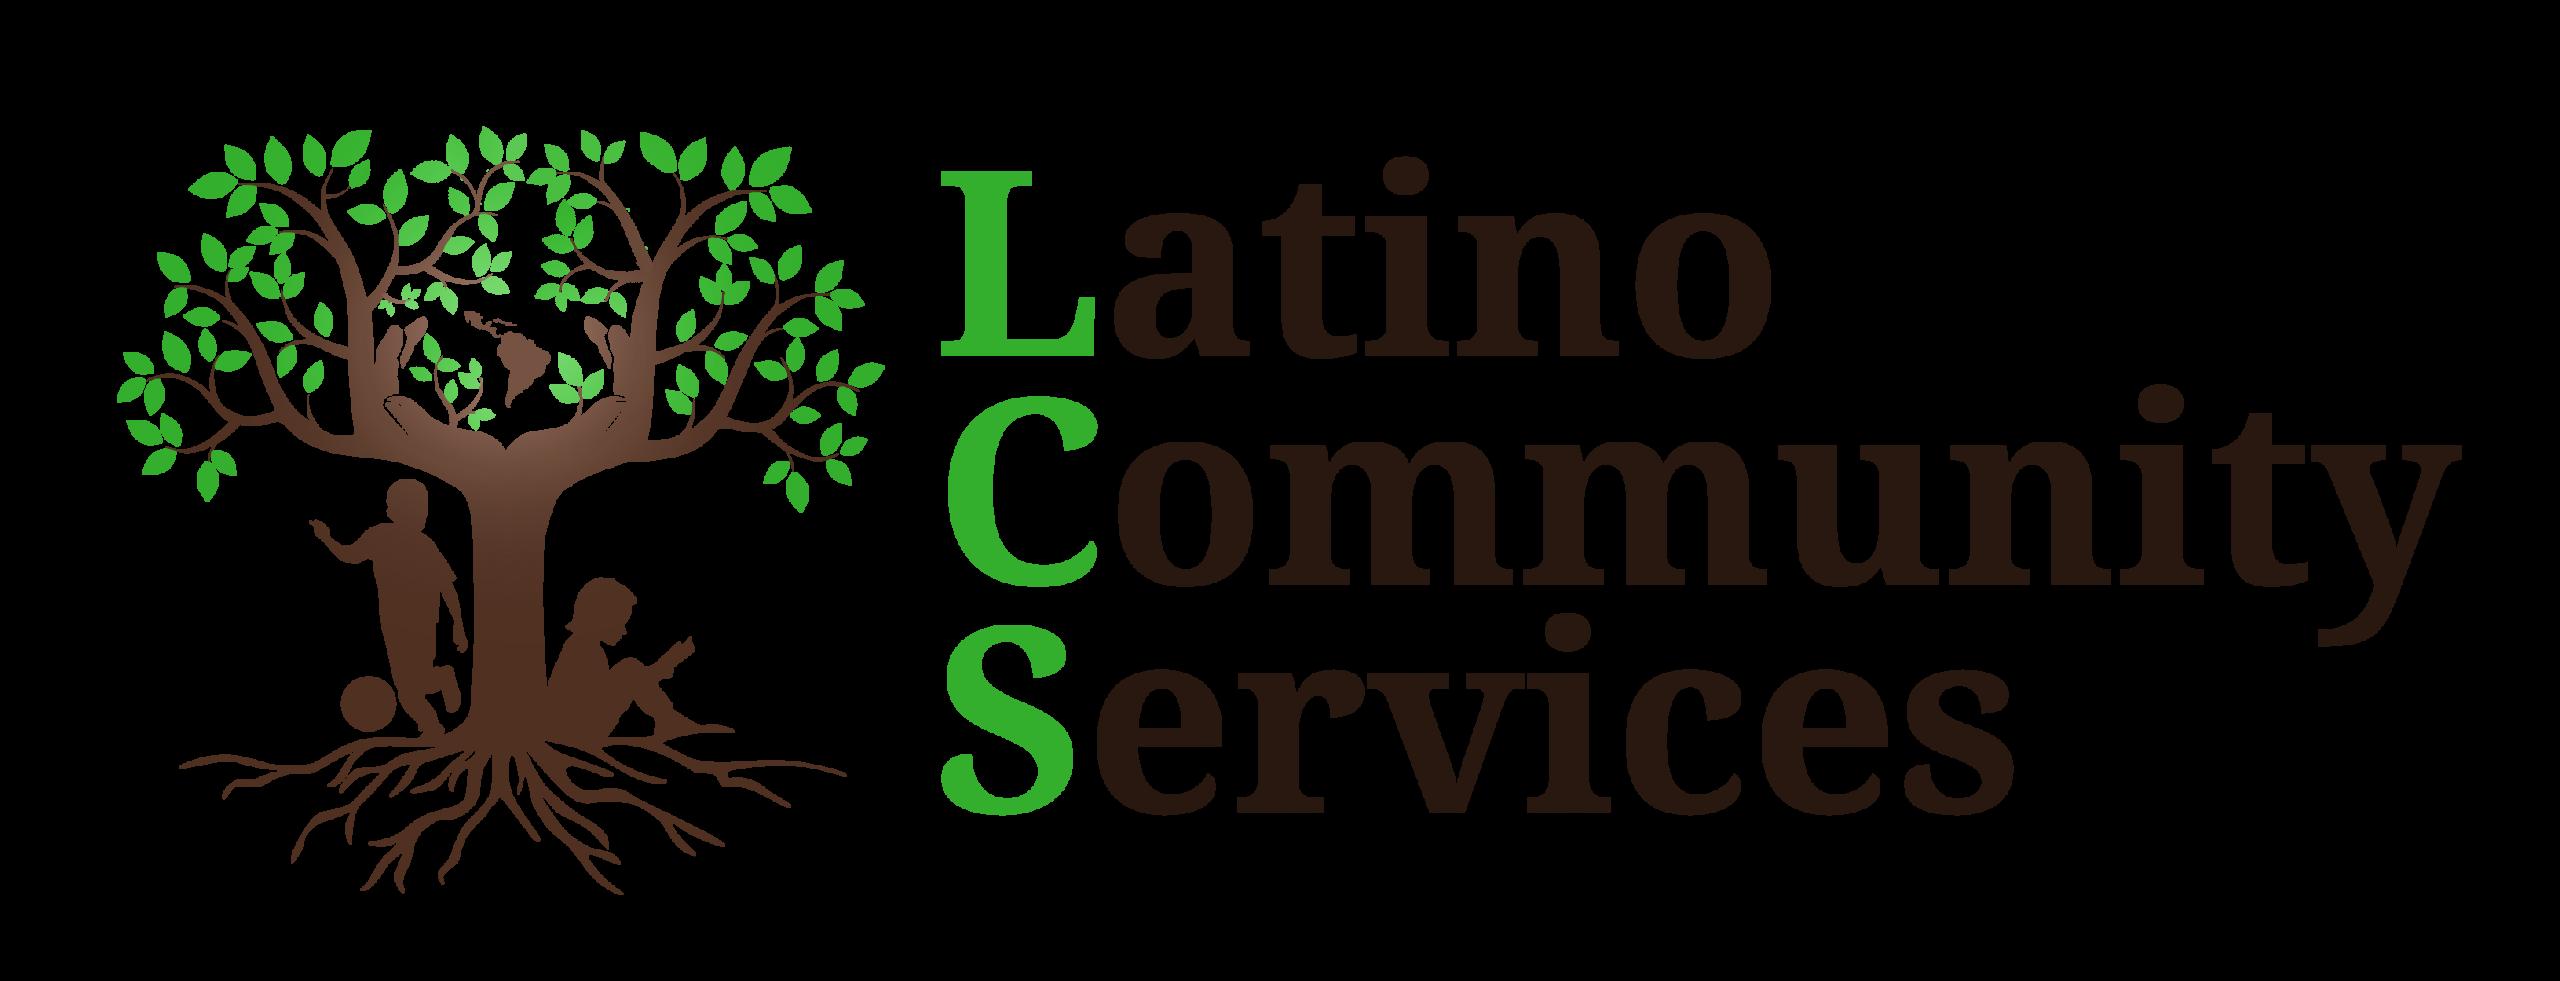 Latino Community Services